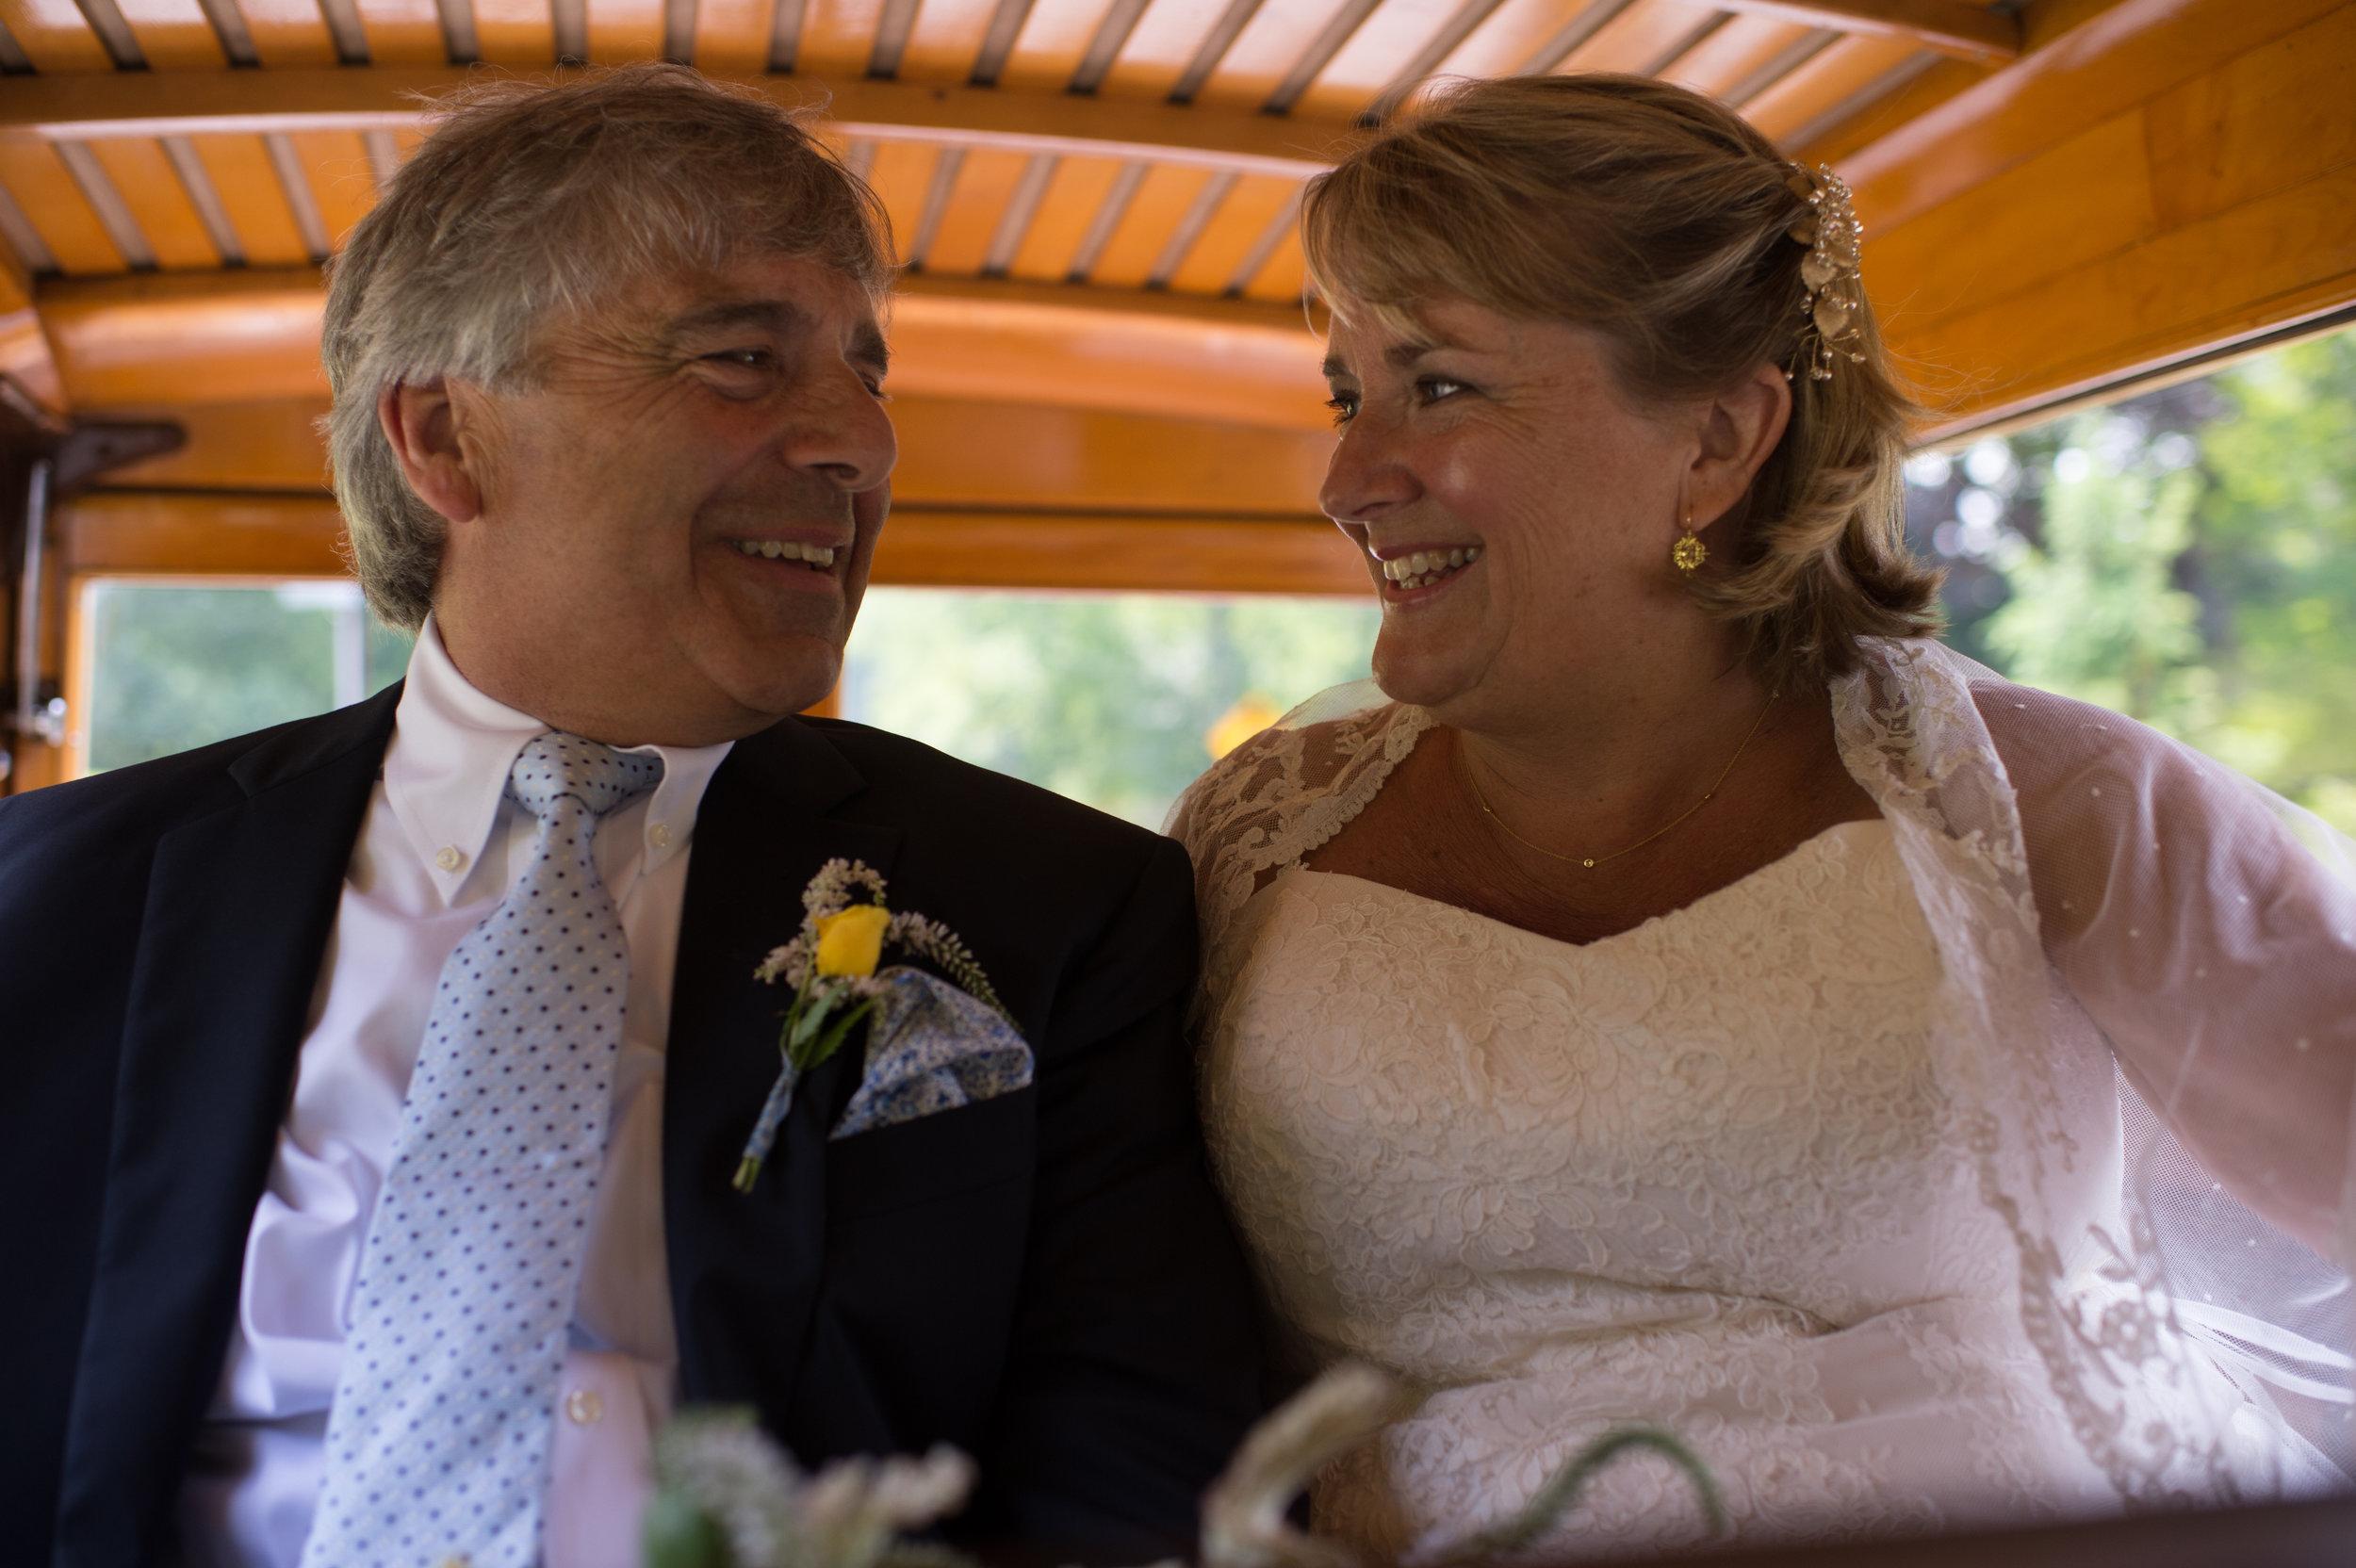 Weddings 15. Inside Car.jpg